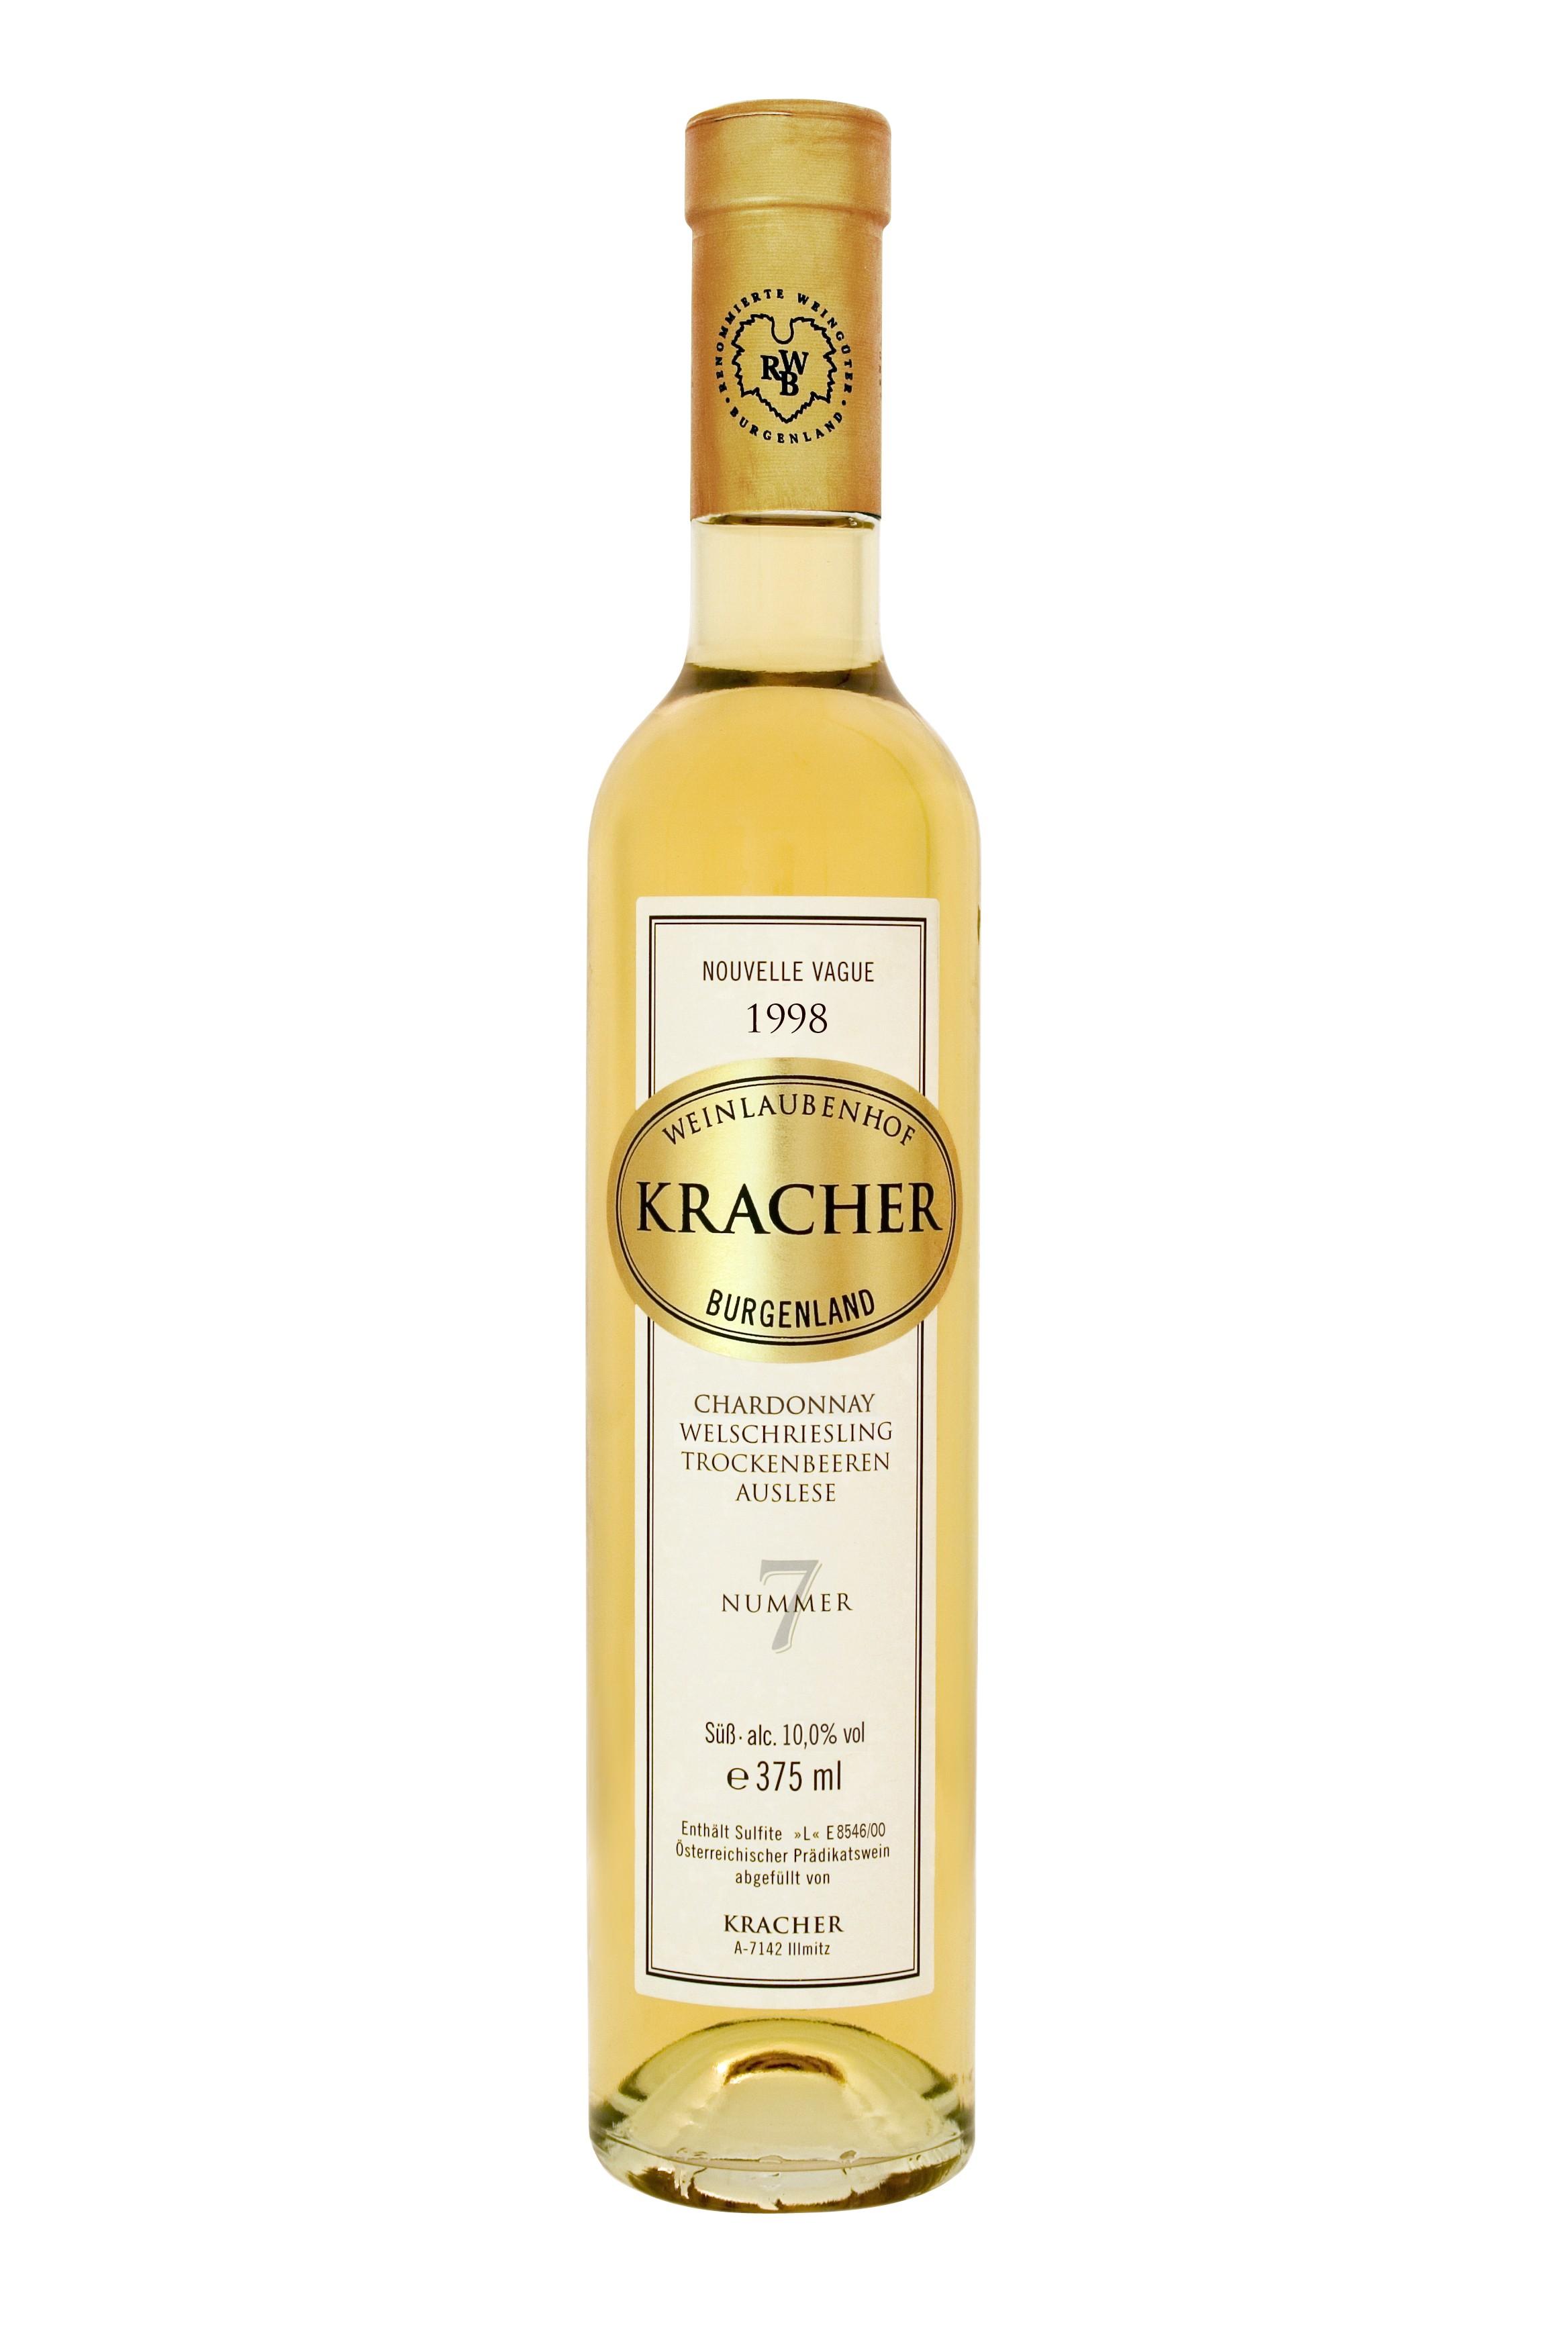 Kracher - Rarität Chardonnay-Welschriesling Nr. 7 Trockenbeerenauslese, 1998